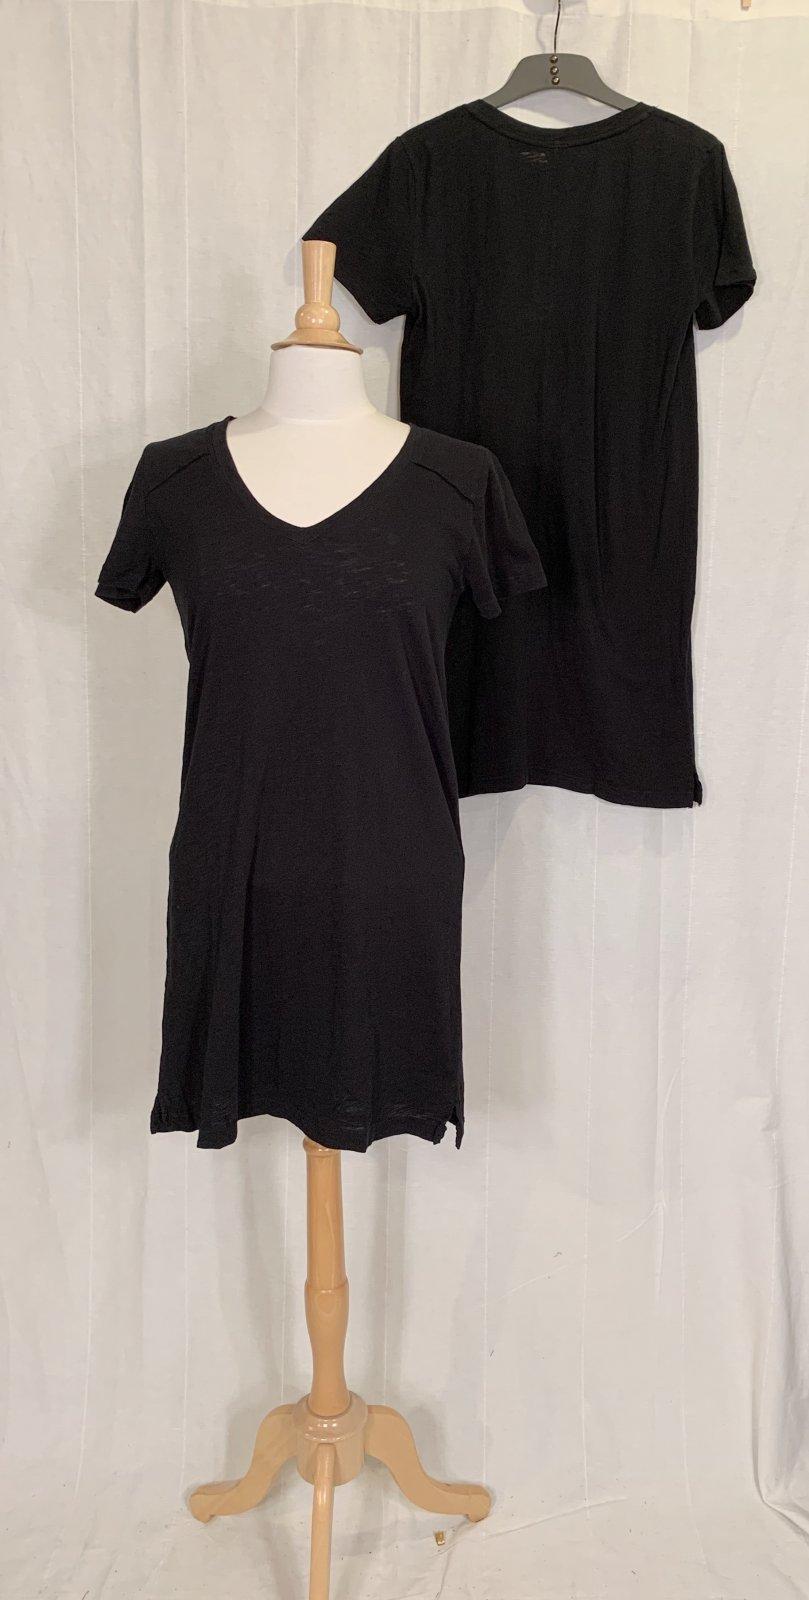 Bobi S/S V-neck Dress